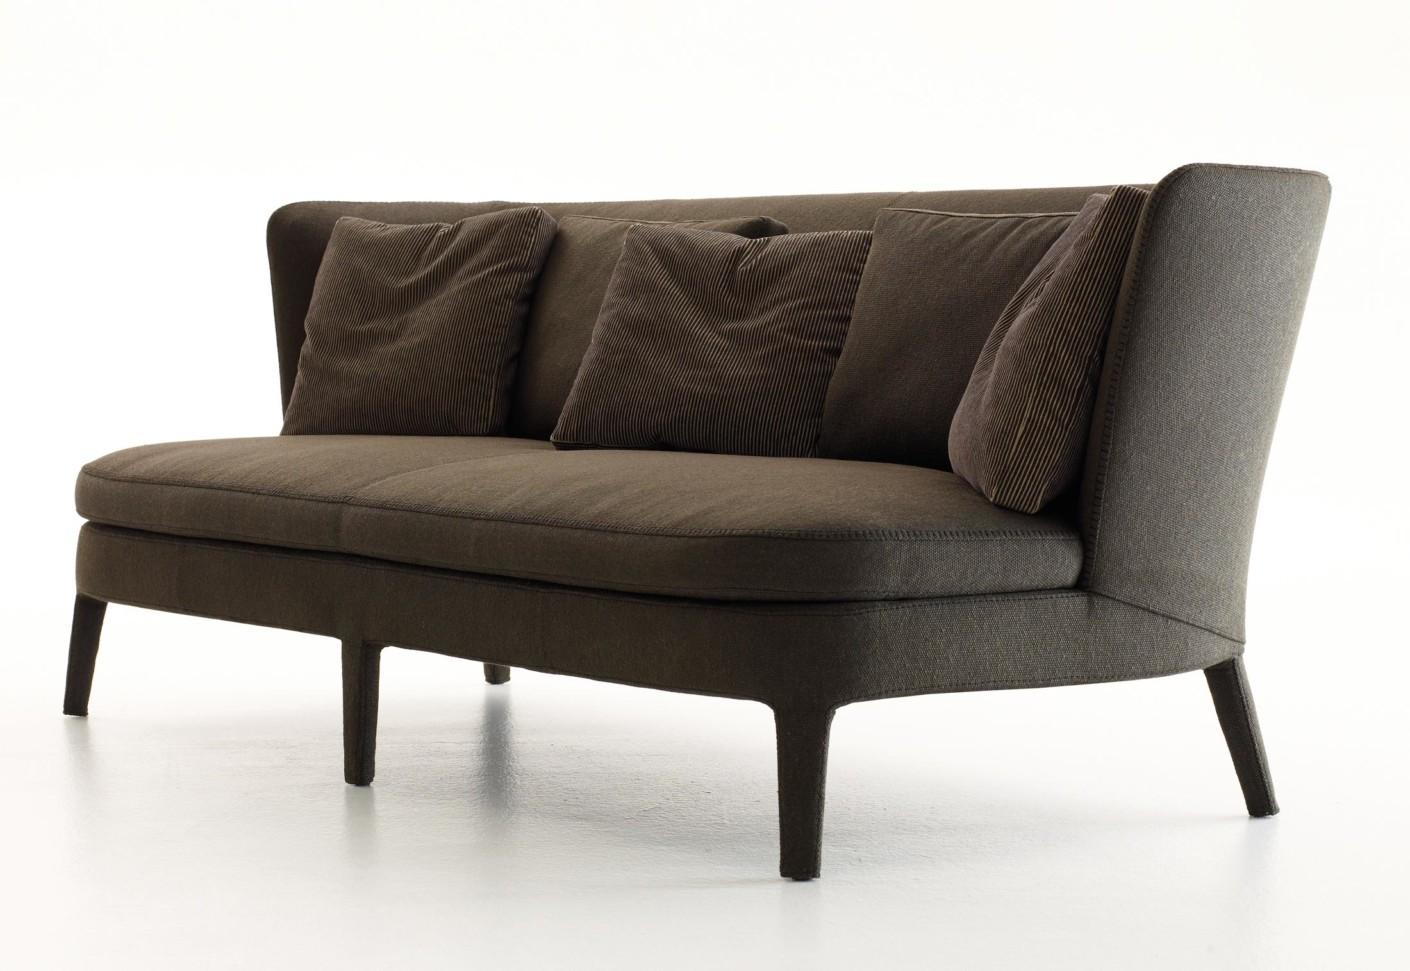 febo sofa 2803b by maxalto stylepark. Black Bedroom Furniture Sets. Home Design Ideas